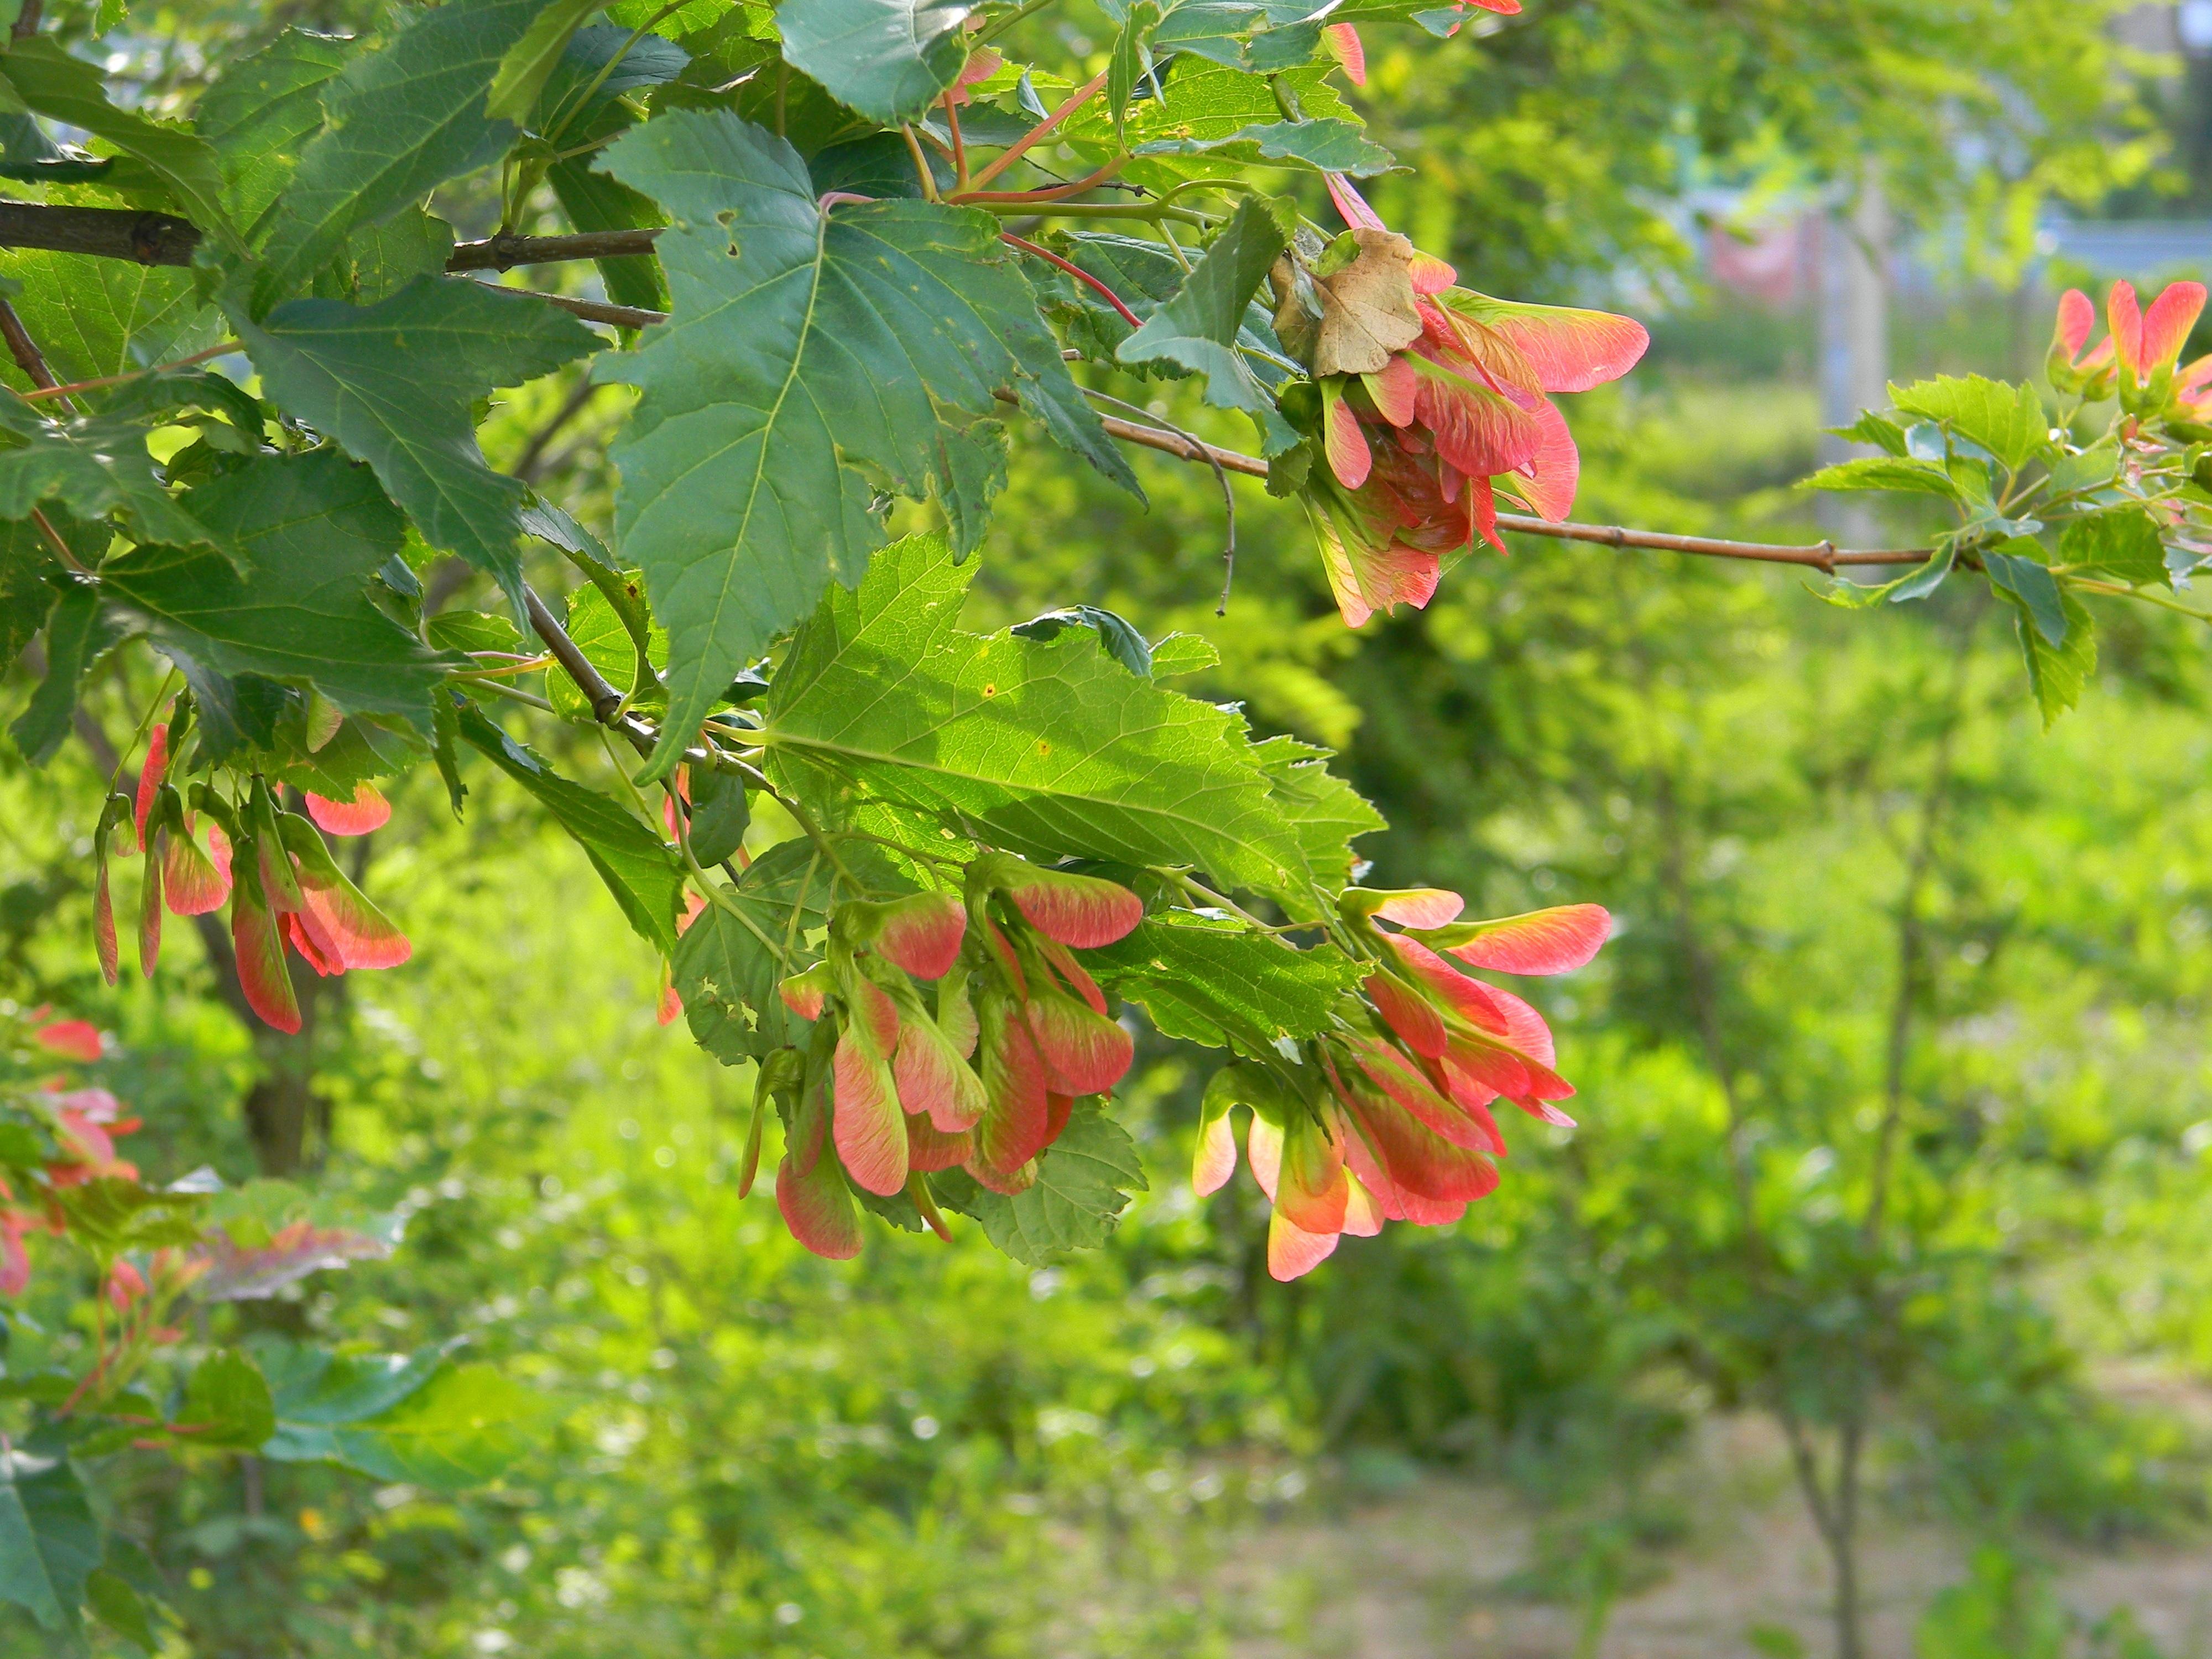 Free Images : nature, branch, blossom, leaf, flower, summer, produce ...